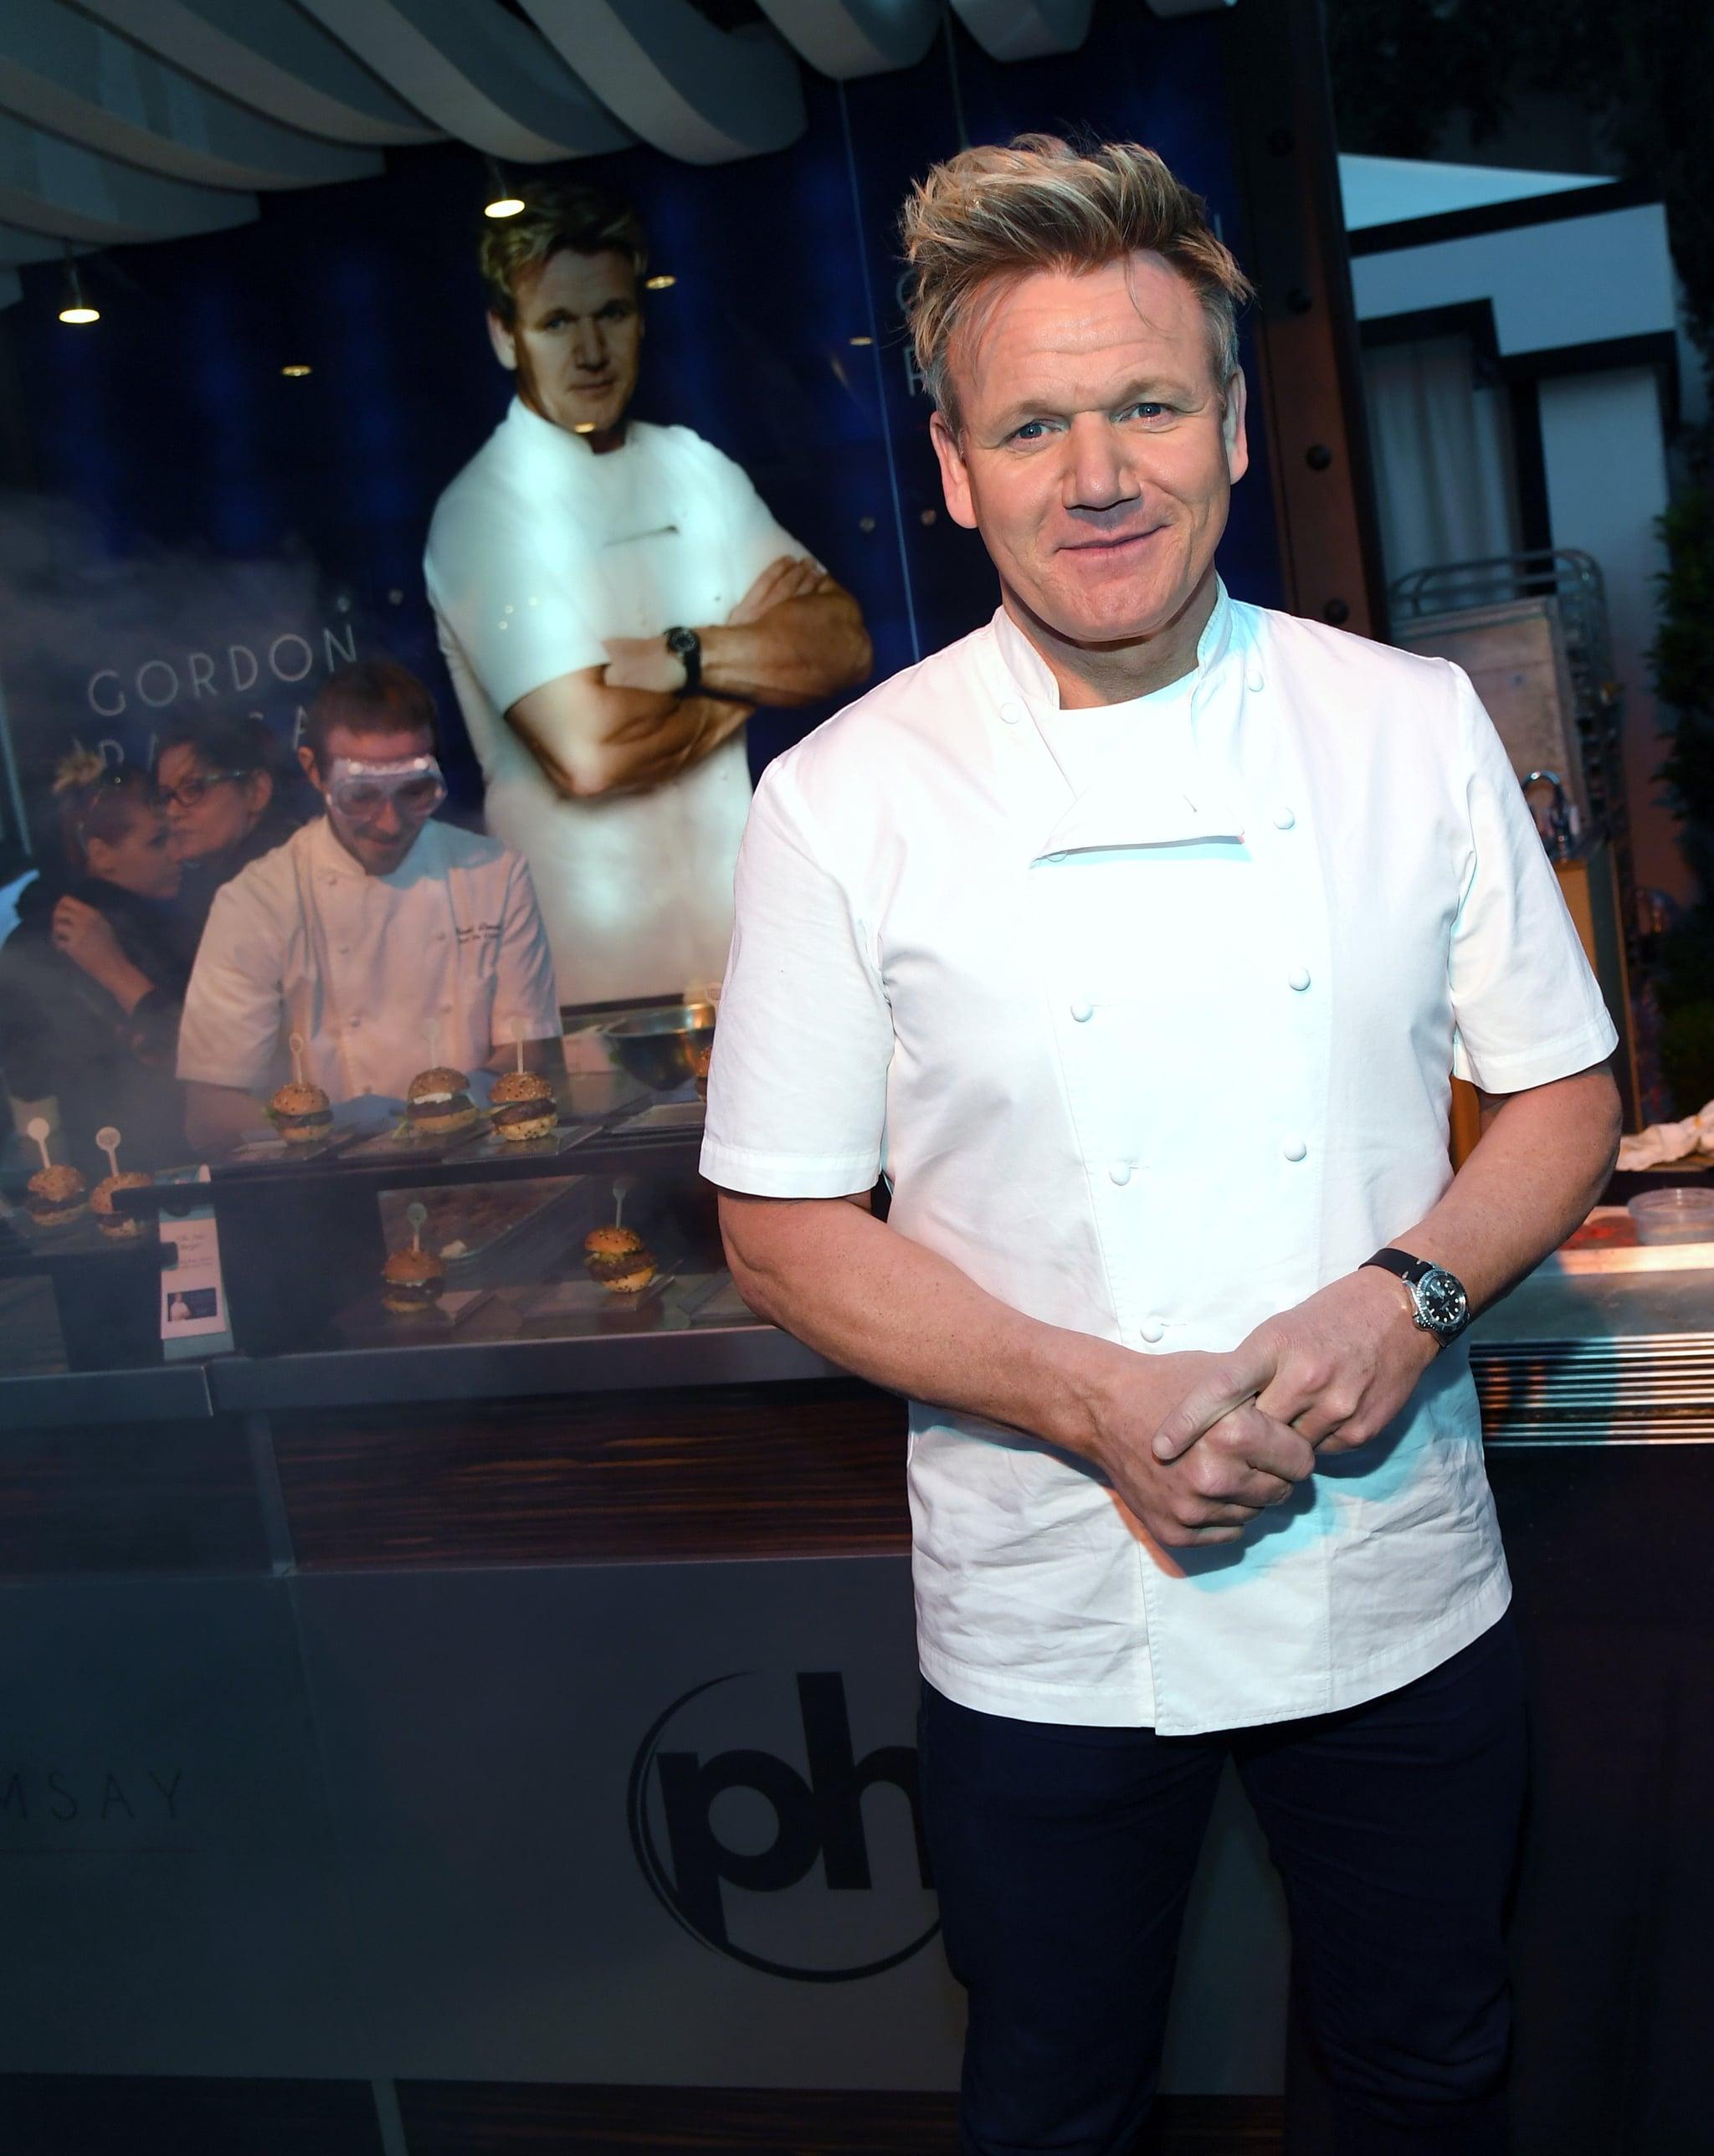 On Ramsay Hell's Kitchen Restaurant | Gordon Ramsay Hell S Kitchen Restaurant Popsugar Food